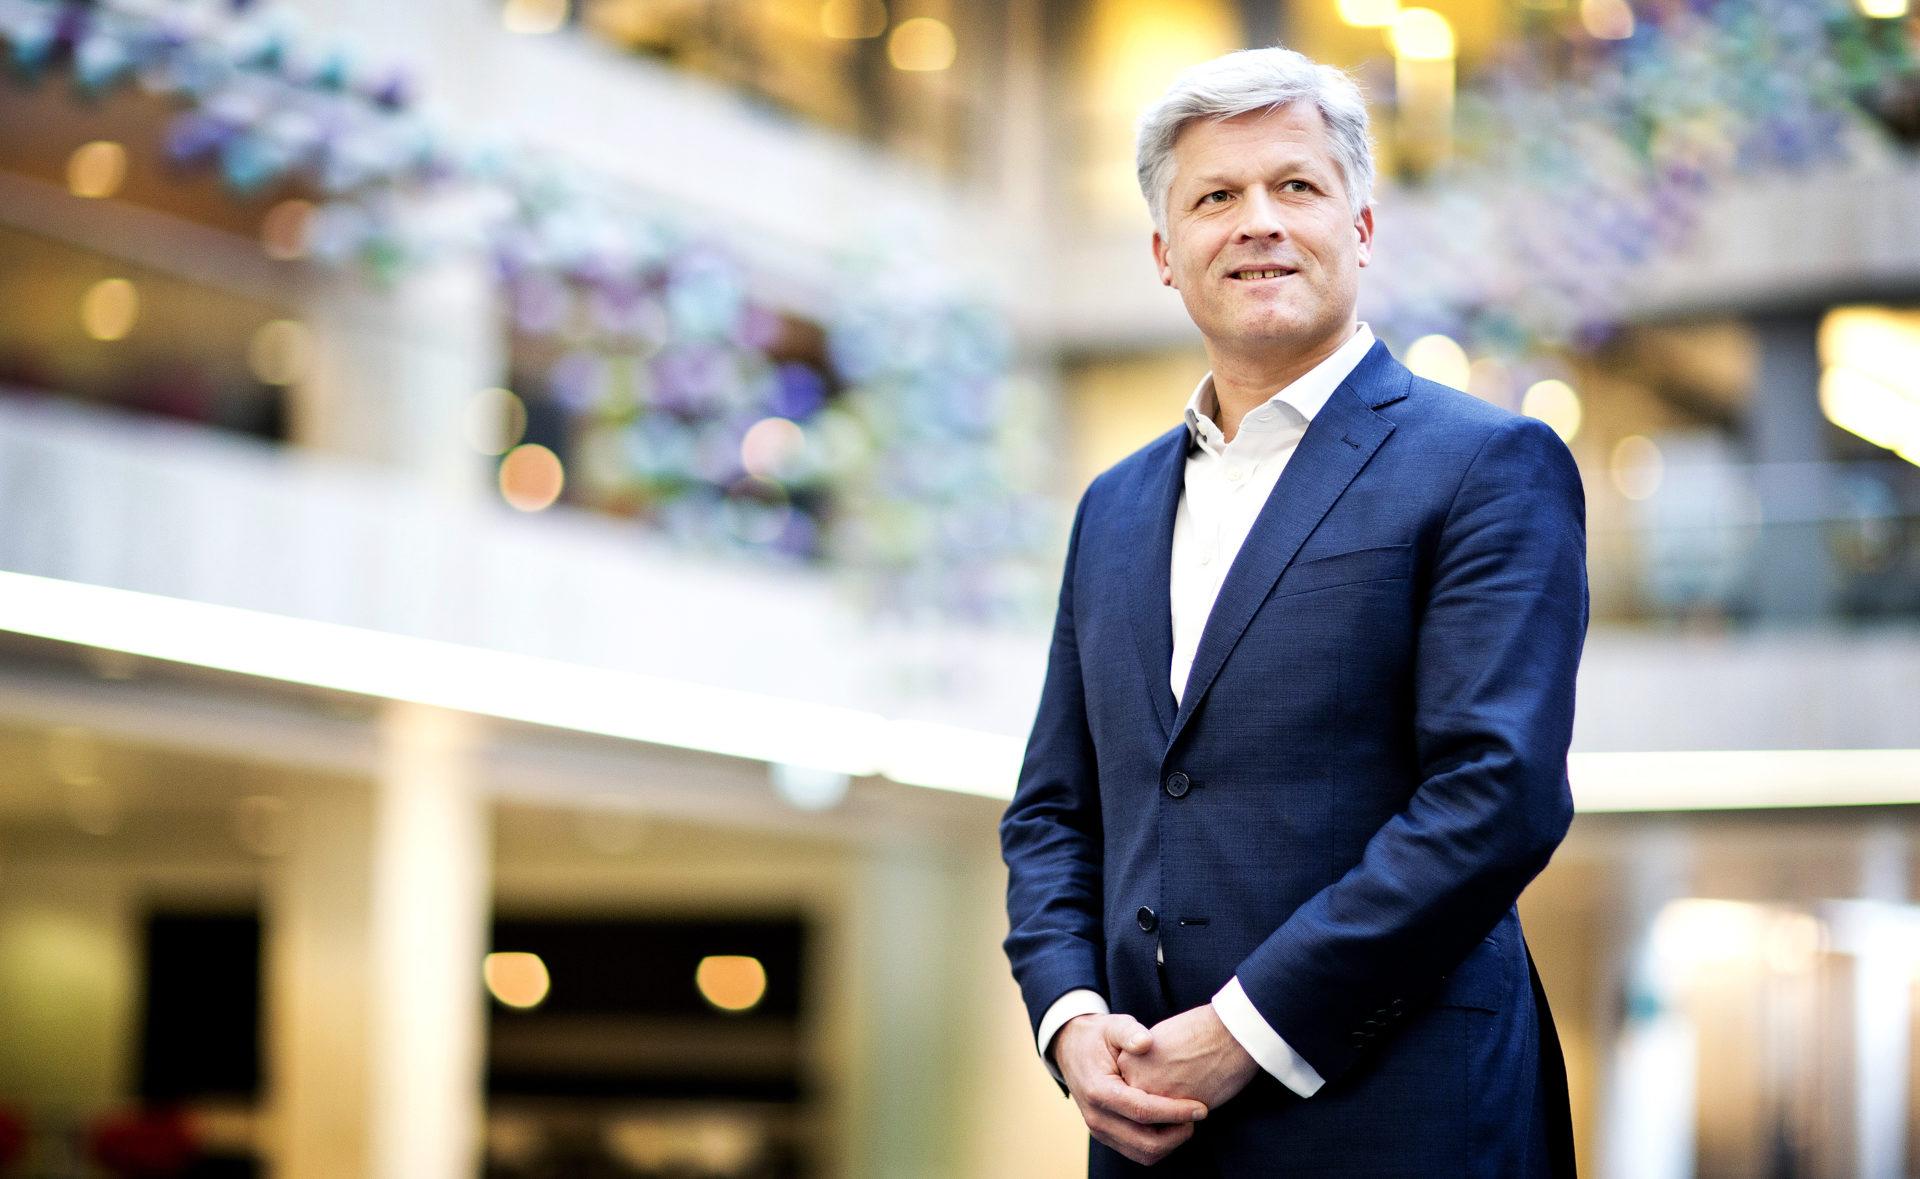 Aegon CEO Maarten Edixhoven